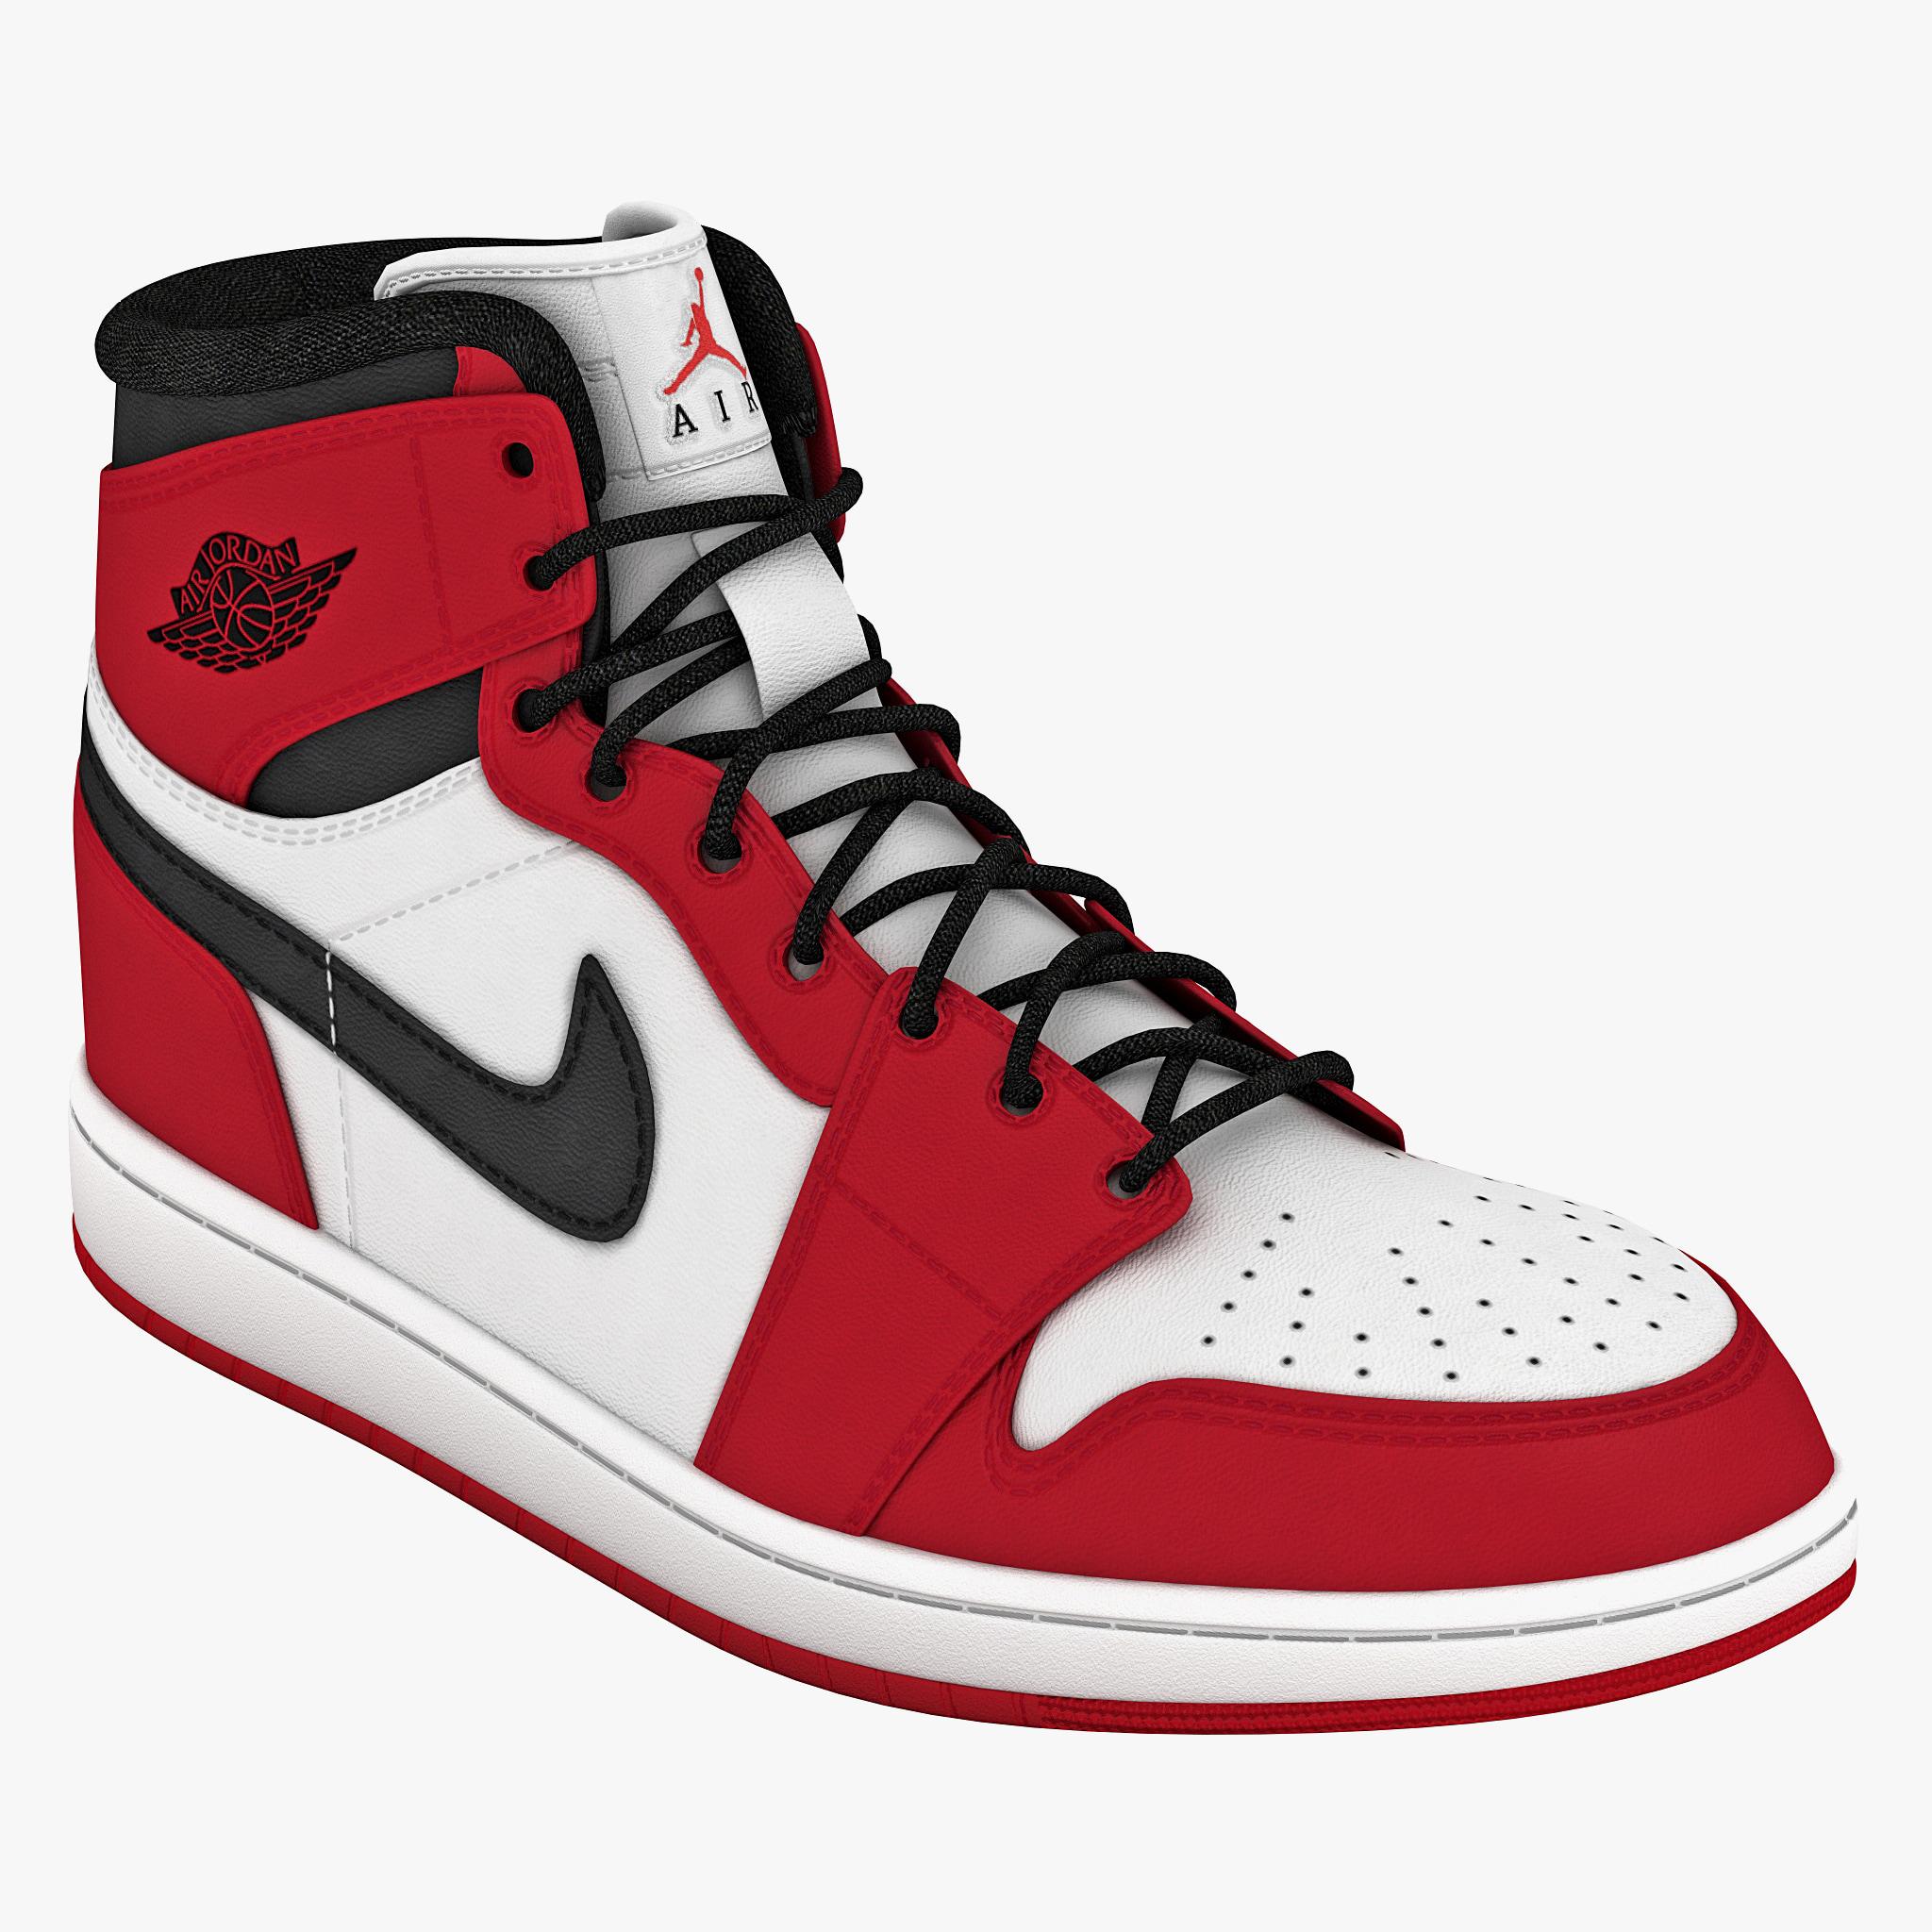 395835_Shoes_Air_Jordans_1___0000.jpg